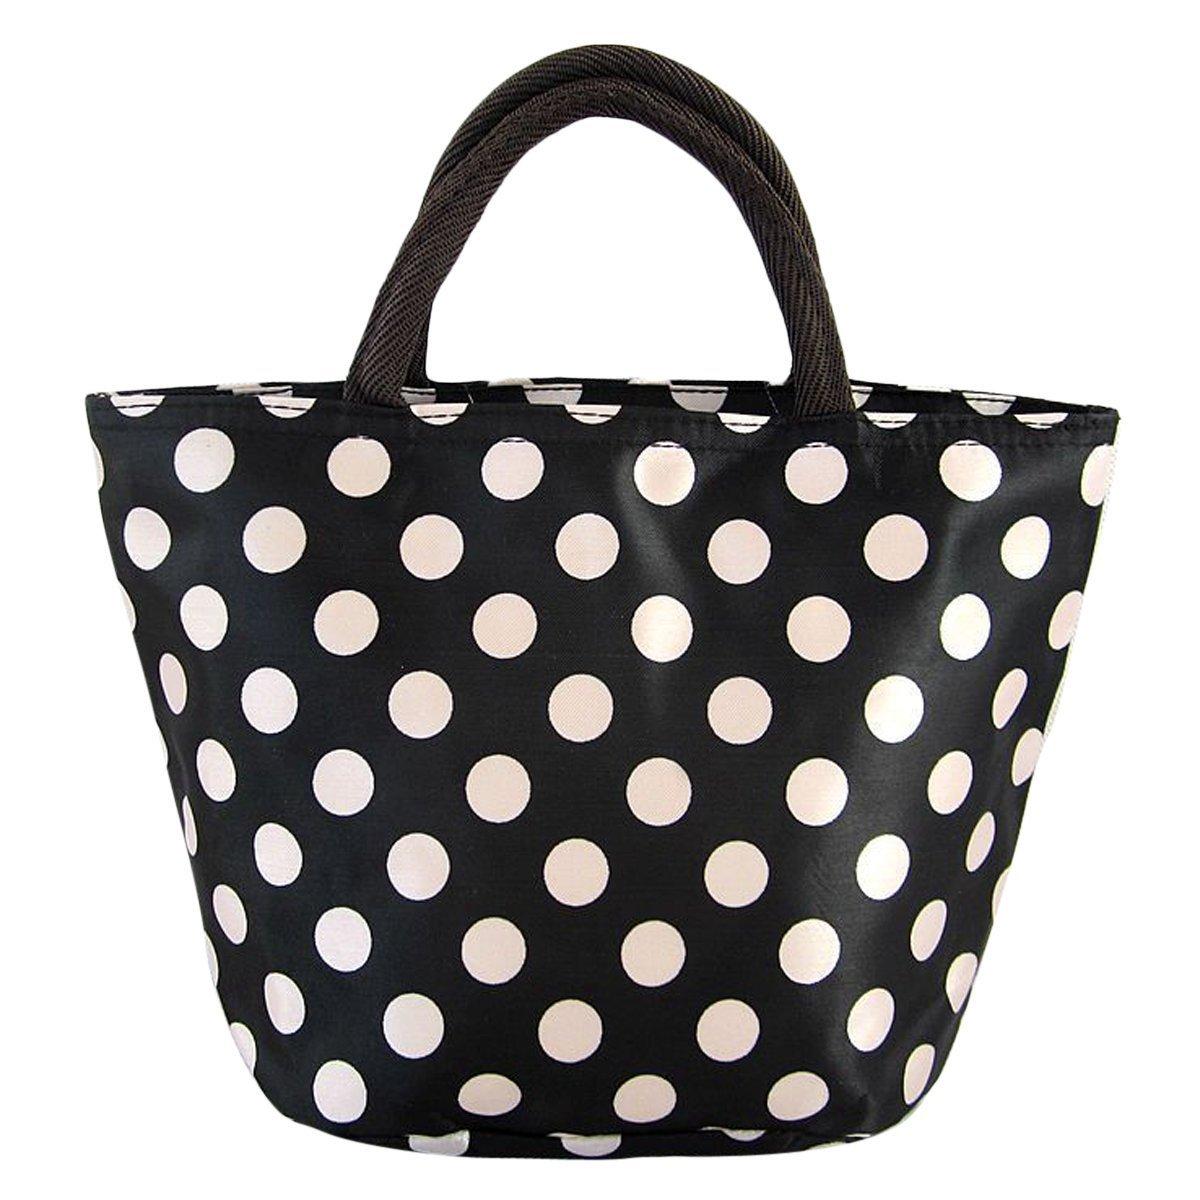 Waterproof Picnic Lunch Bag Case Tote Reusable Bags Travel Zipper Organizer Box Polka Dot Black White